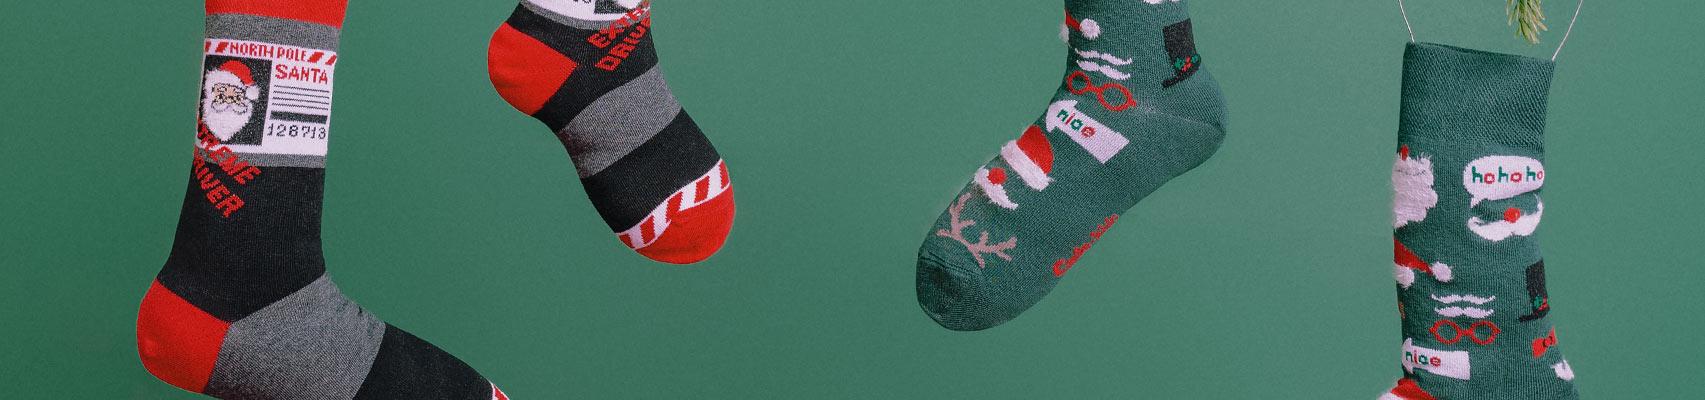 Новогодние носки от Conte, Diwari и Conte-kids